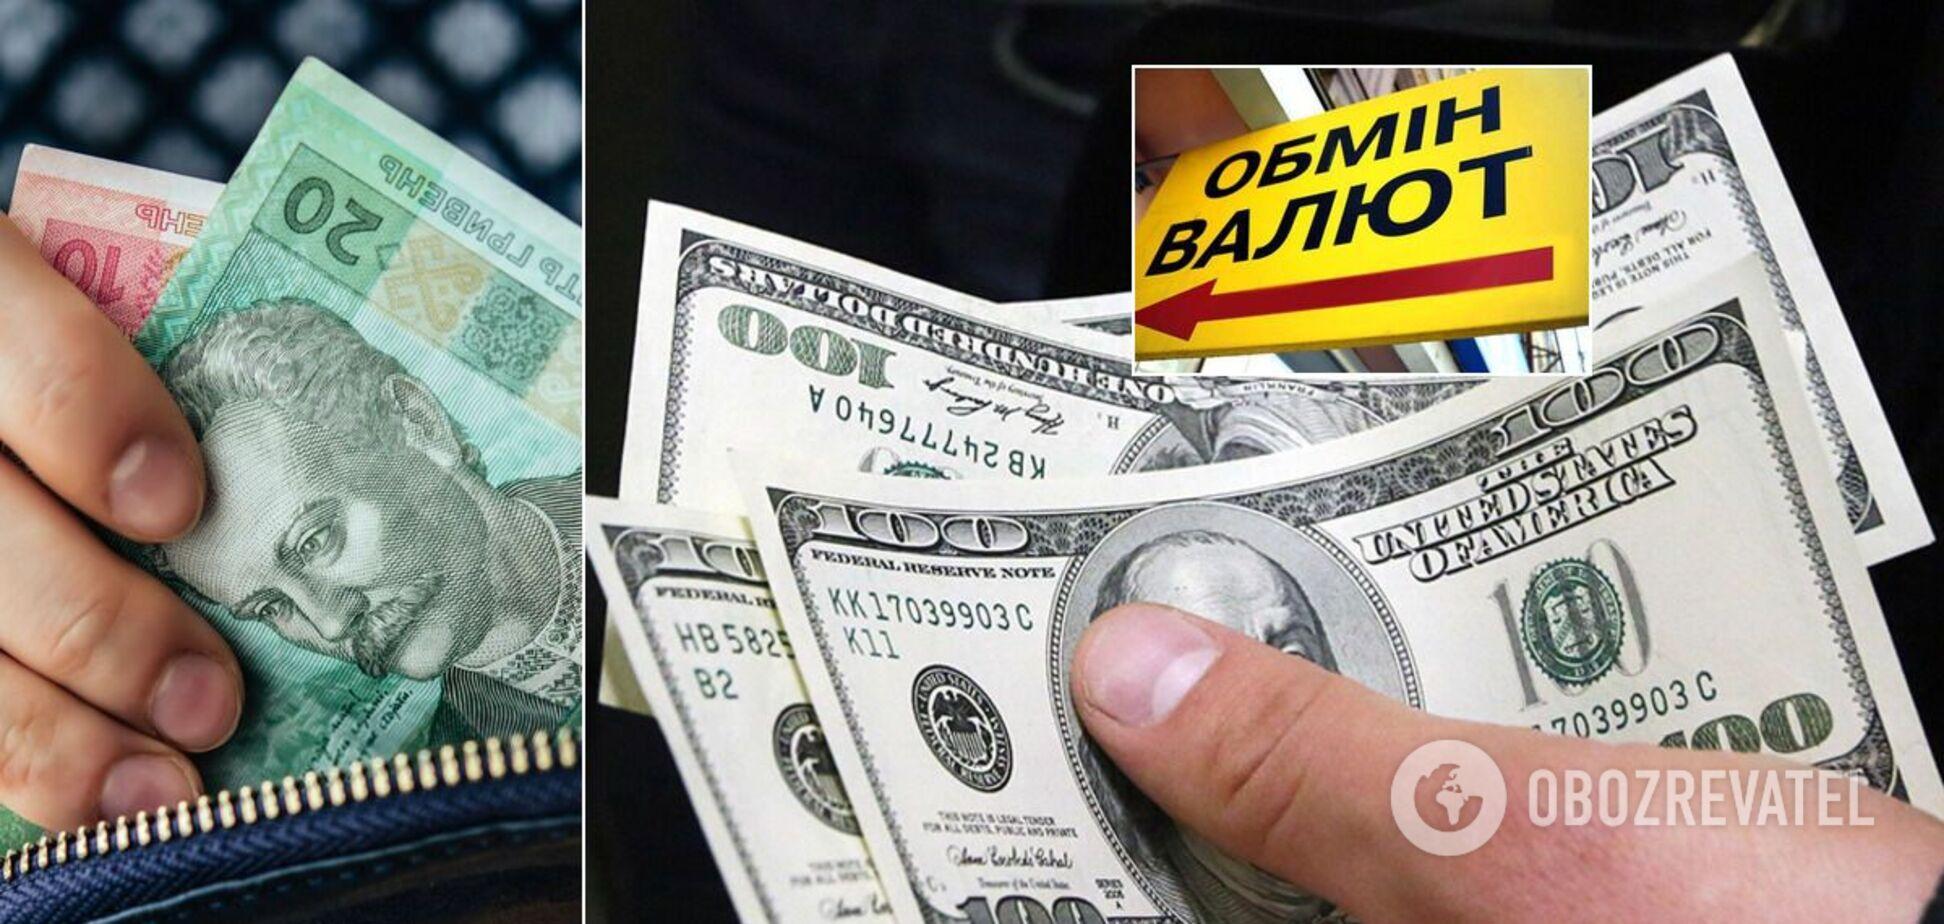 Доллар в Украине подешевеет: аналитики сказали, каким будет курс